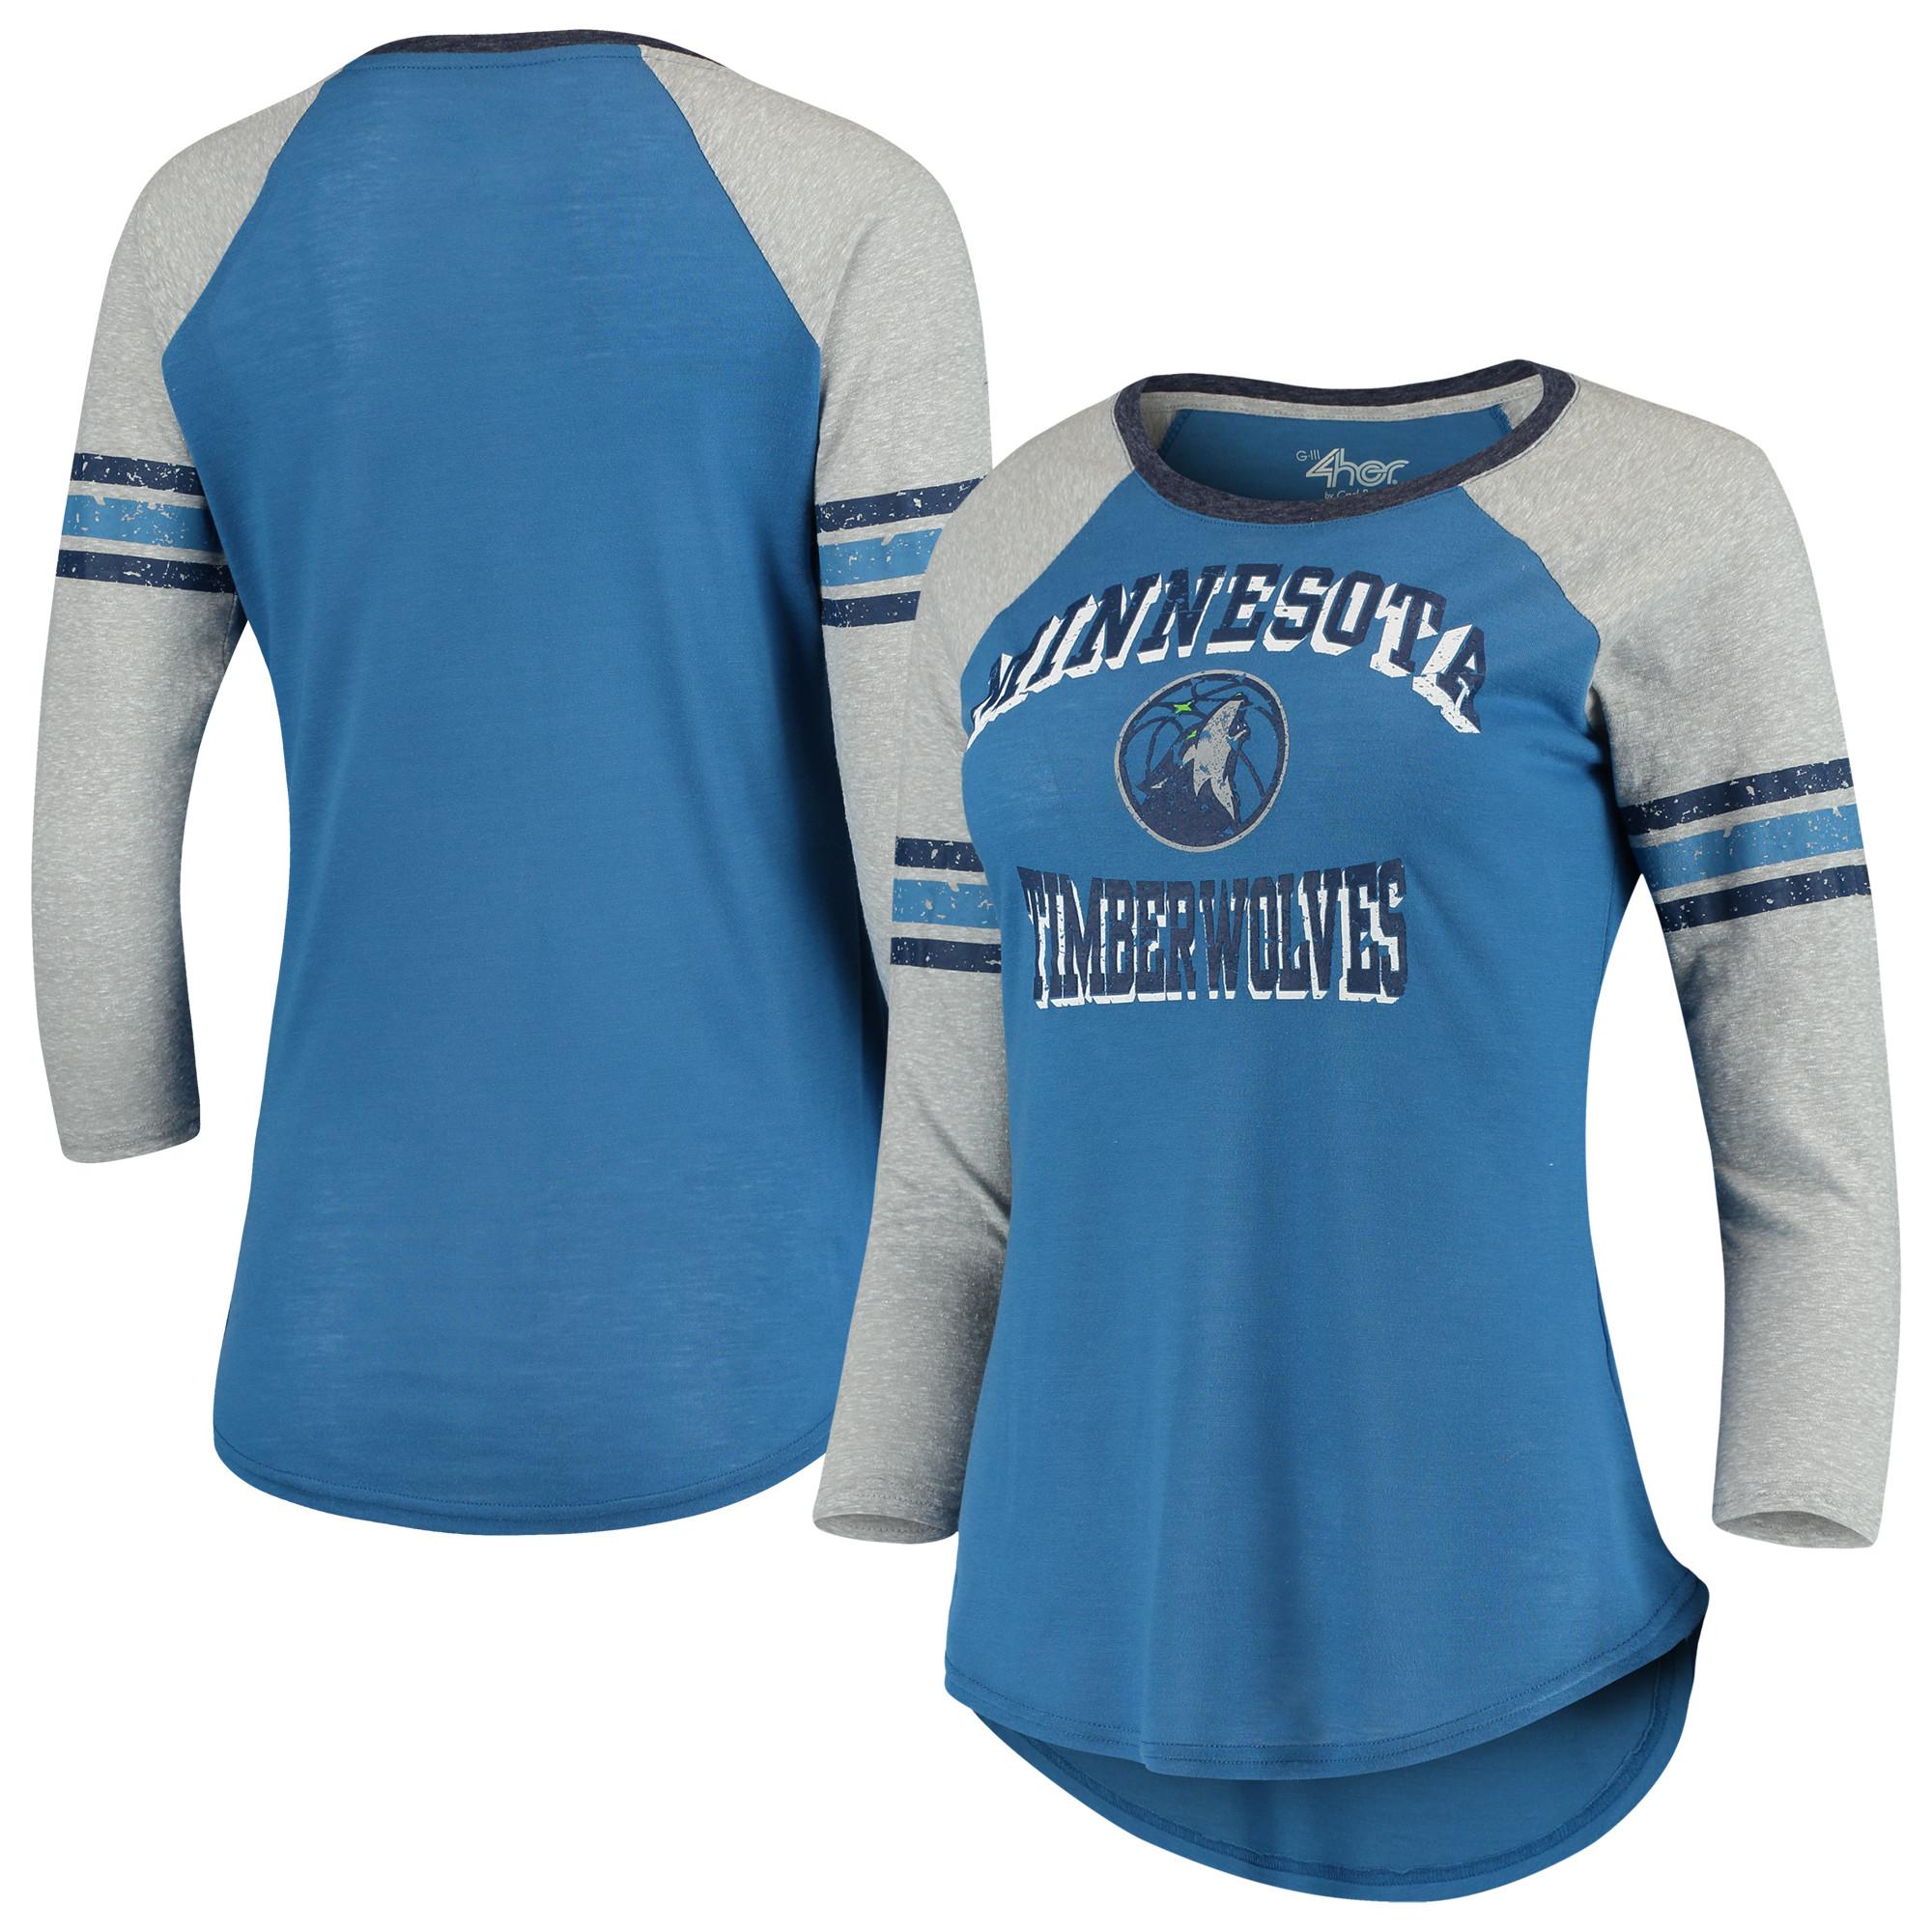 Minnesota Timberwolves G-III 4Her by Carl Banks Women's The Court Tri-Blend Raglan 3/4-Sleeve T-Shirt - Blue/Heathered Gray